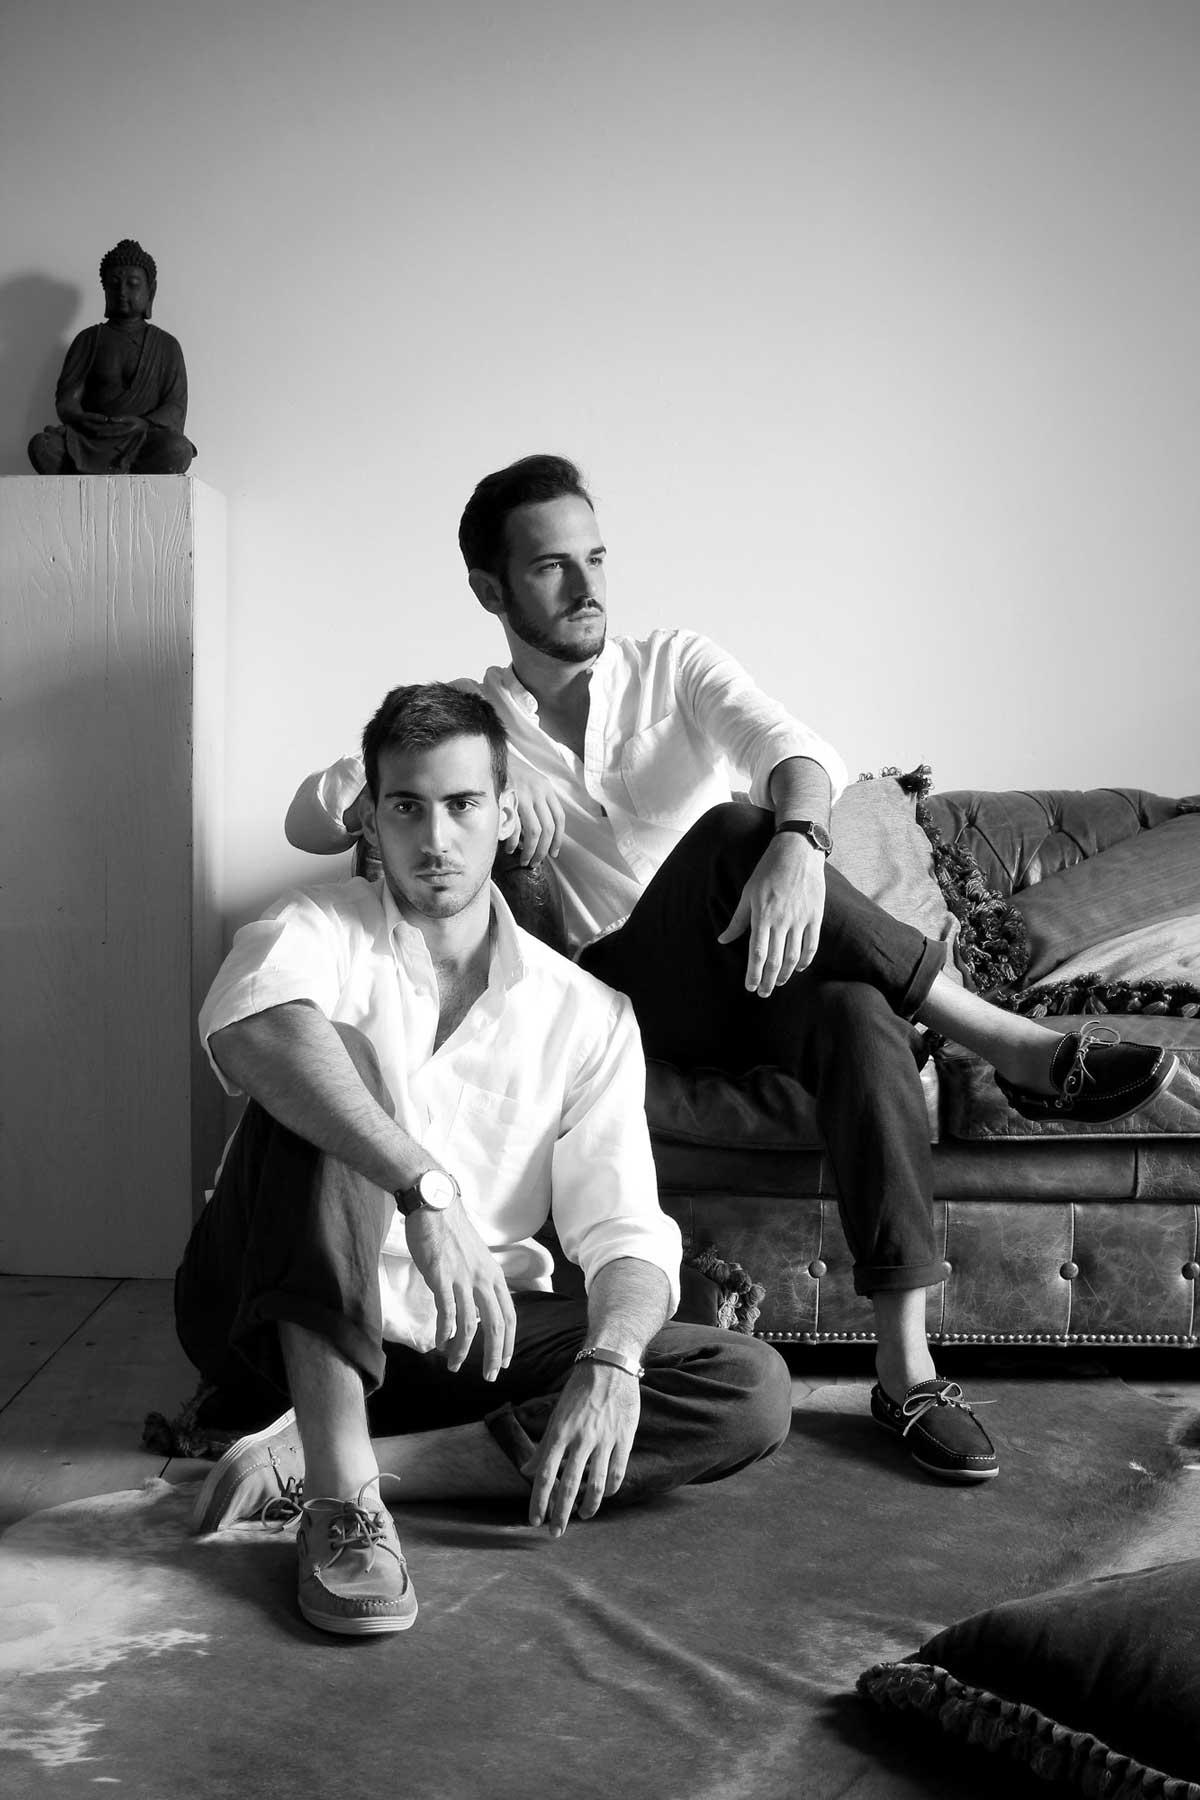 meimorettini-duo-italian-artists